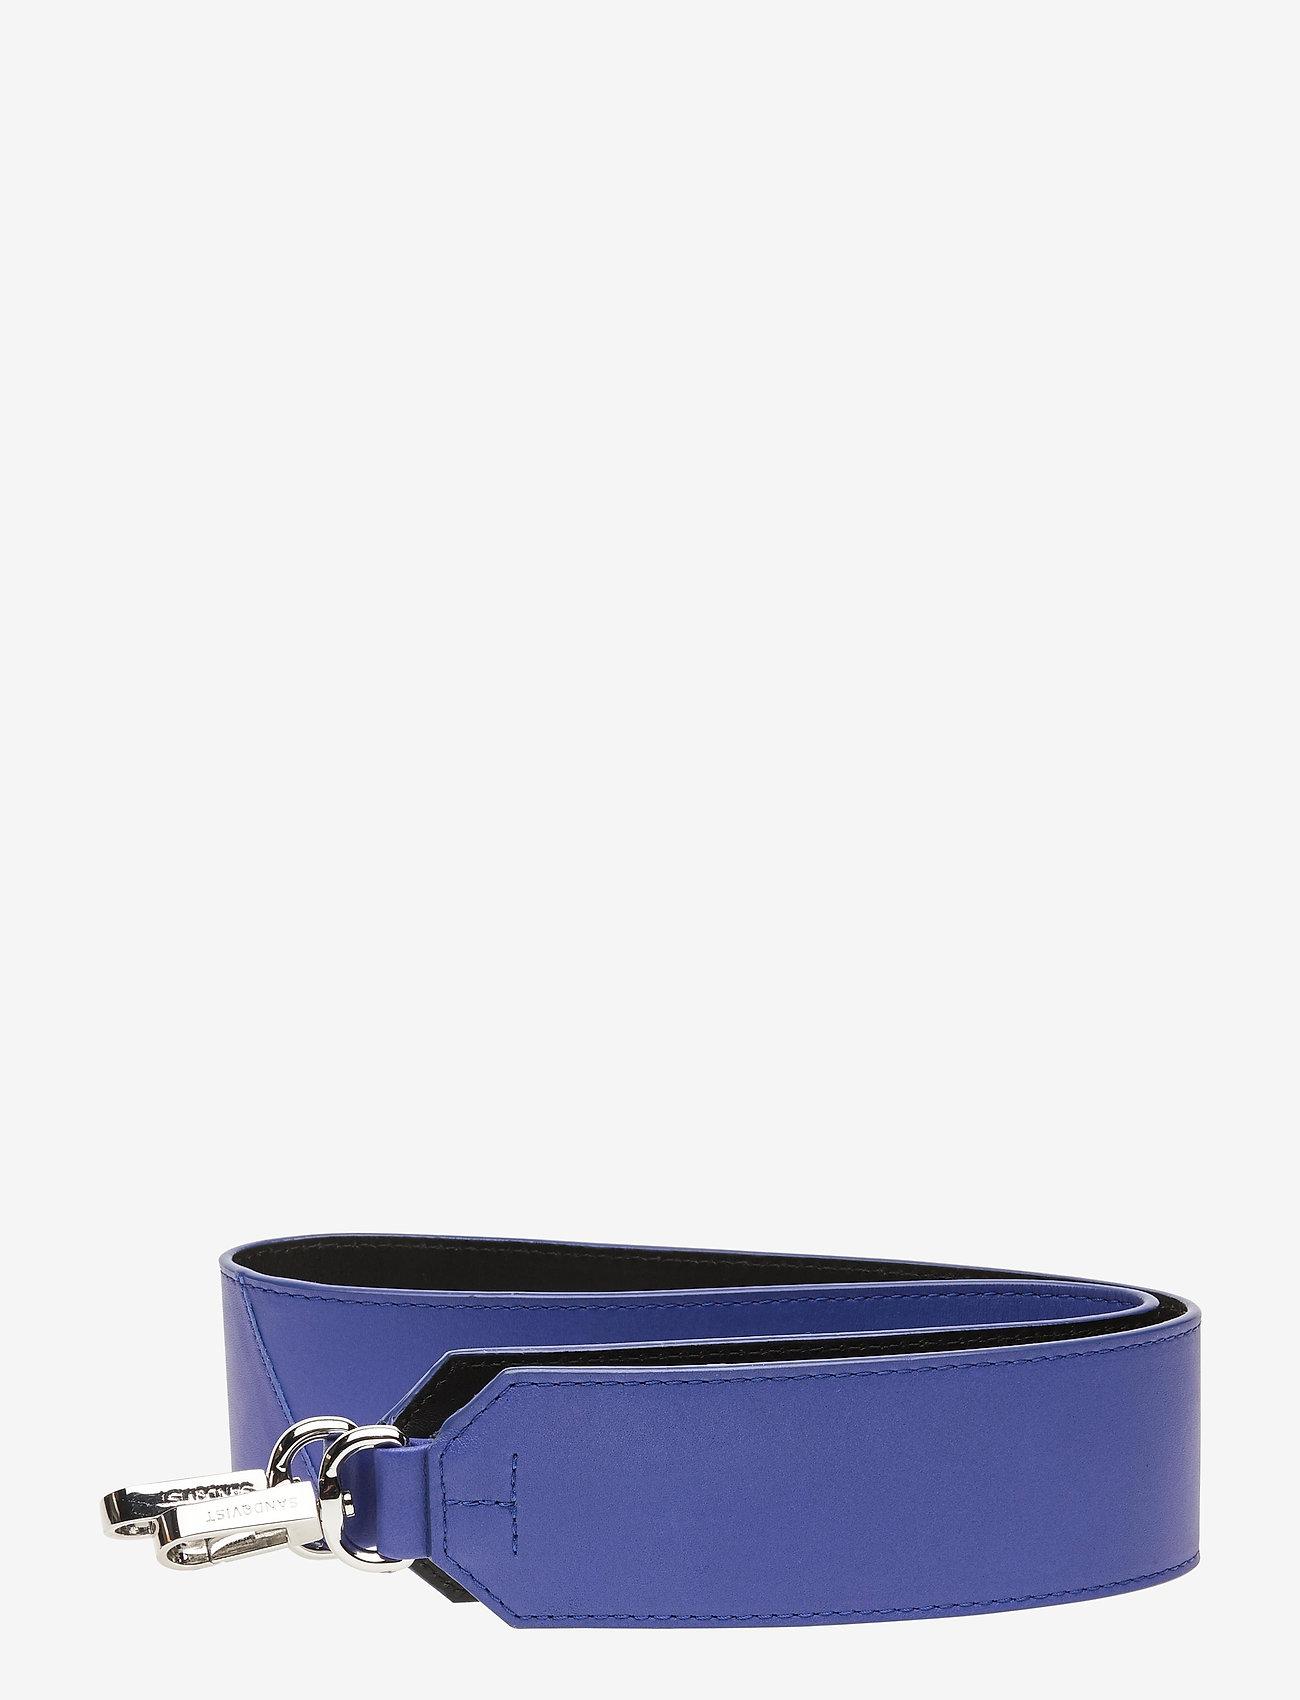 SANDQVIST - SHOULDER STRAP LEATHER - laukun hihnat - bright blue / black - 0